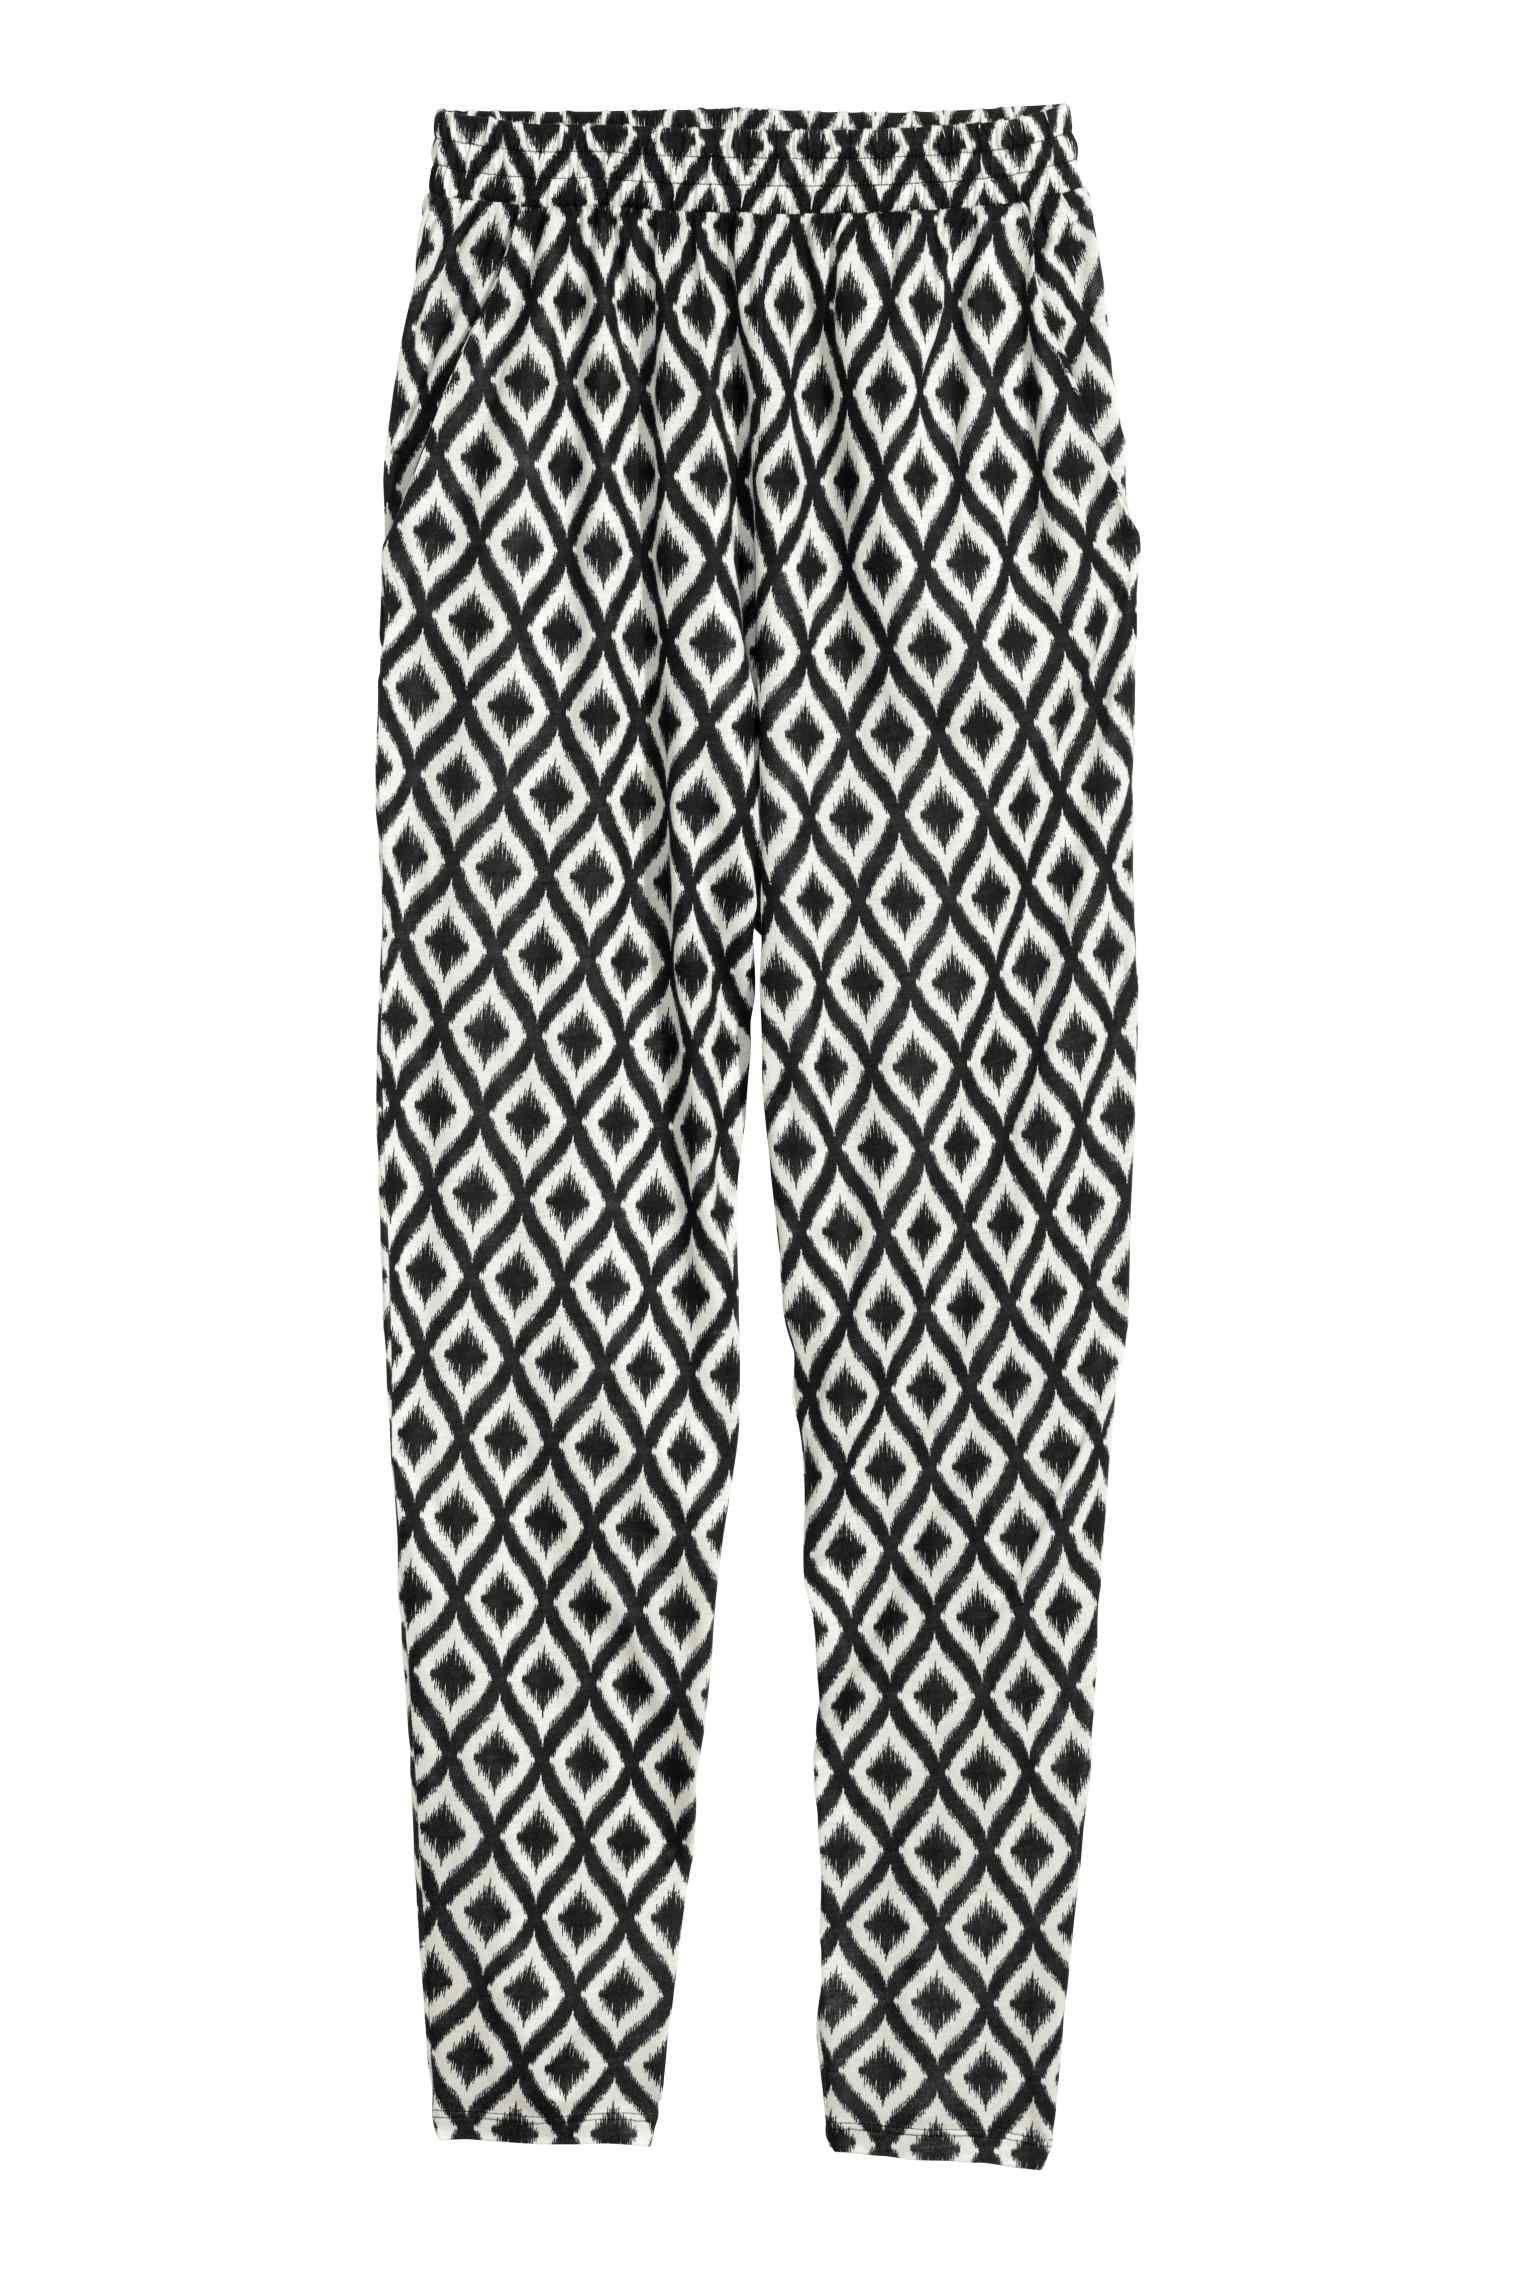 Pantaloni In Jersey Fantasia Pantalones Mujer Pantalon Dama Pantalones